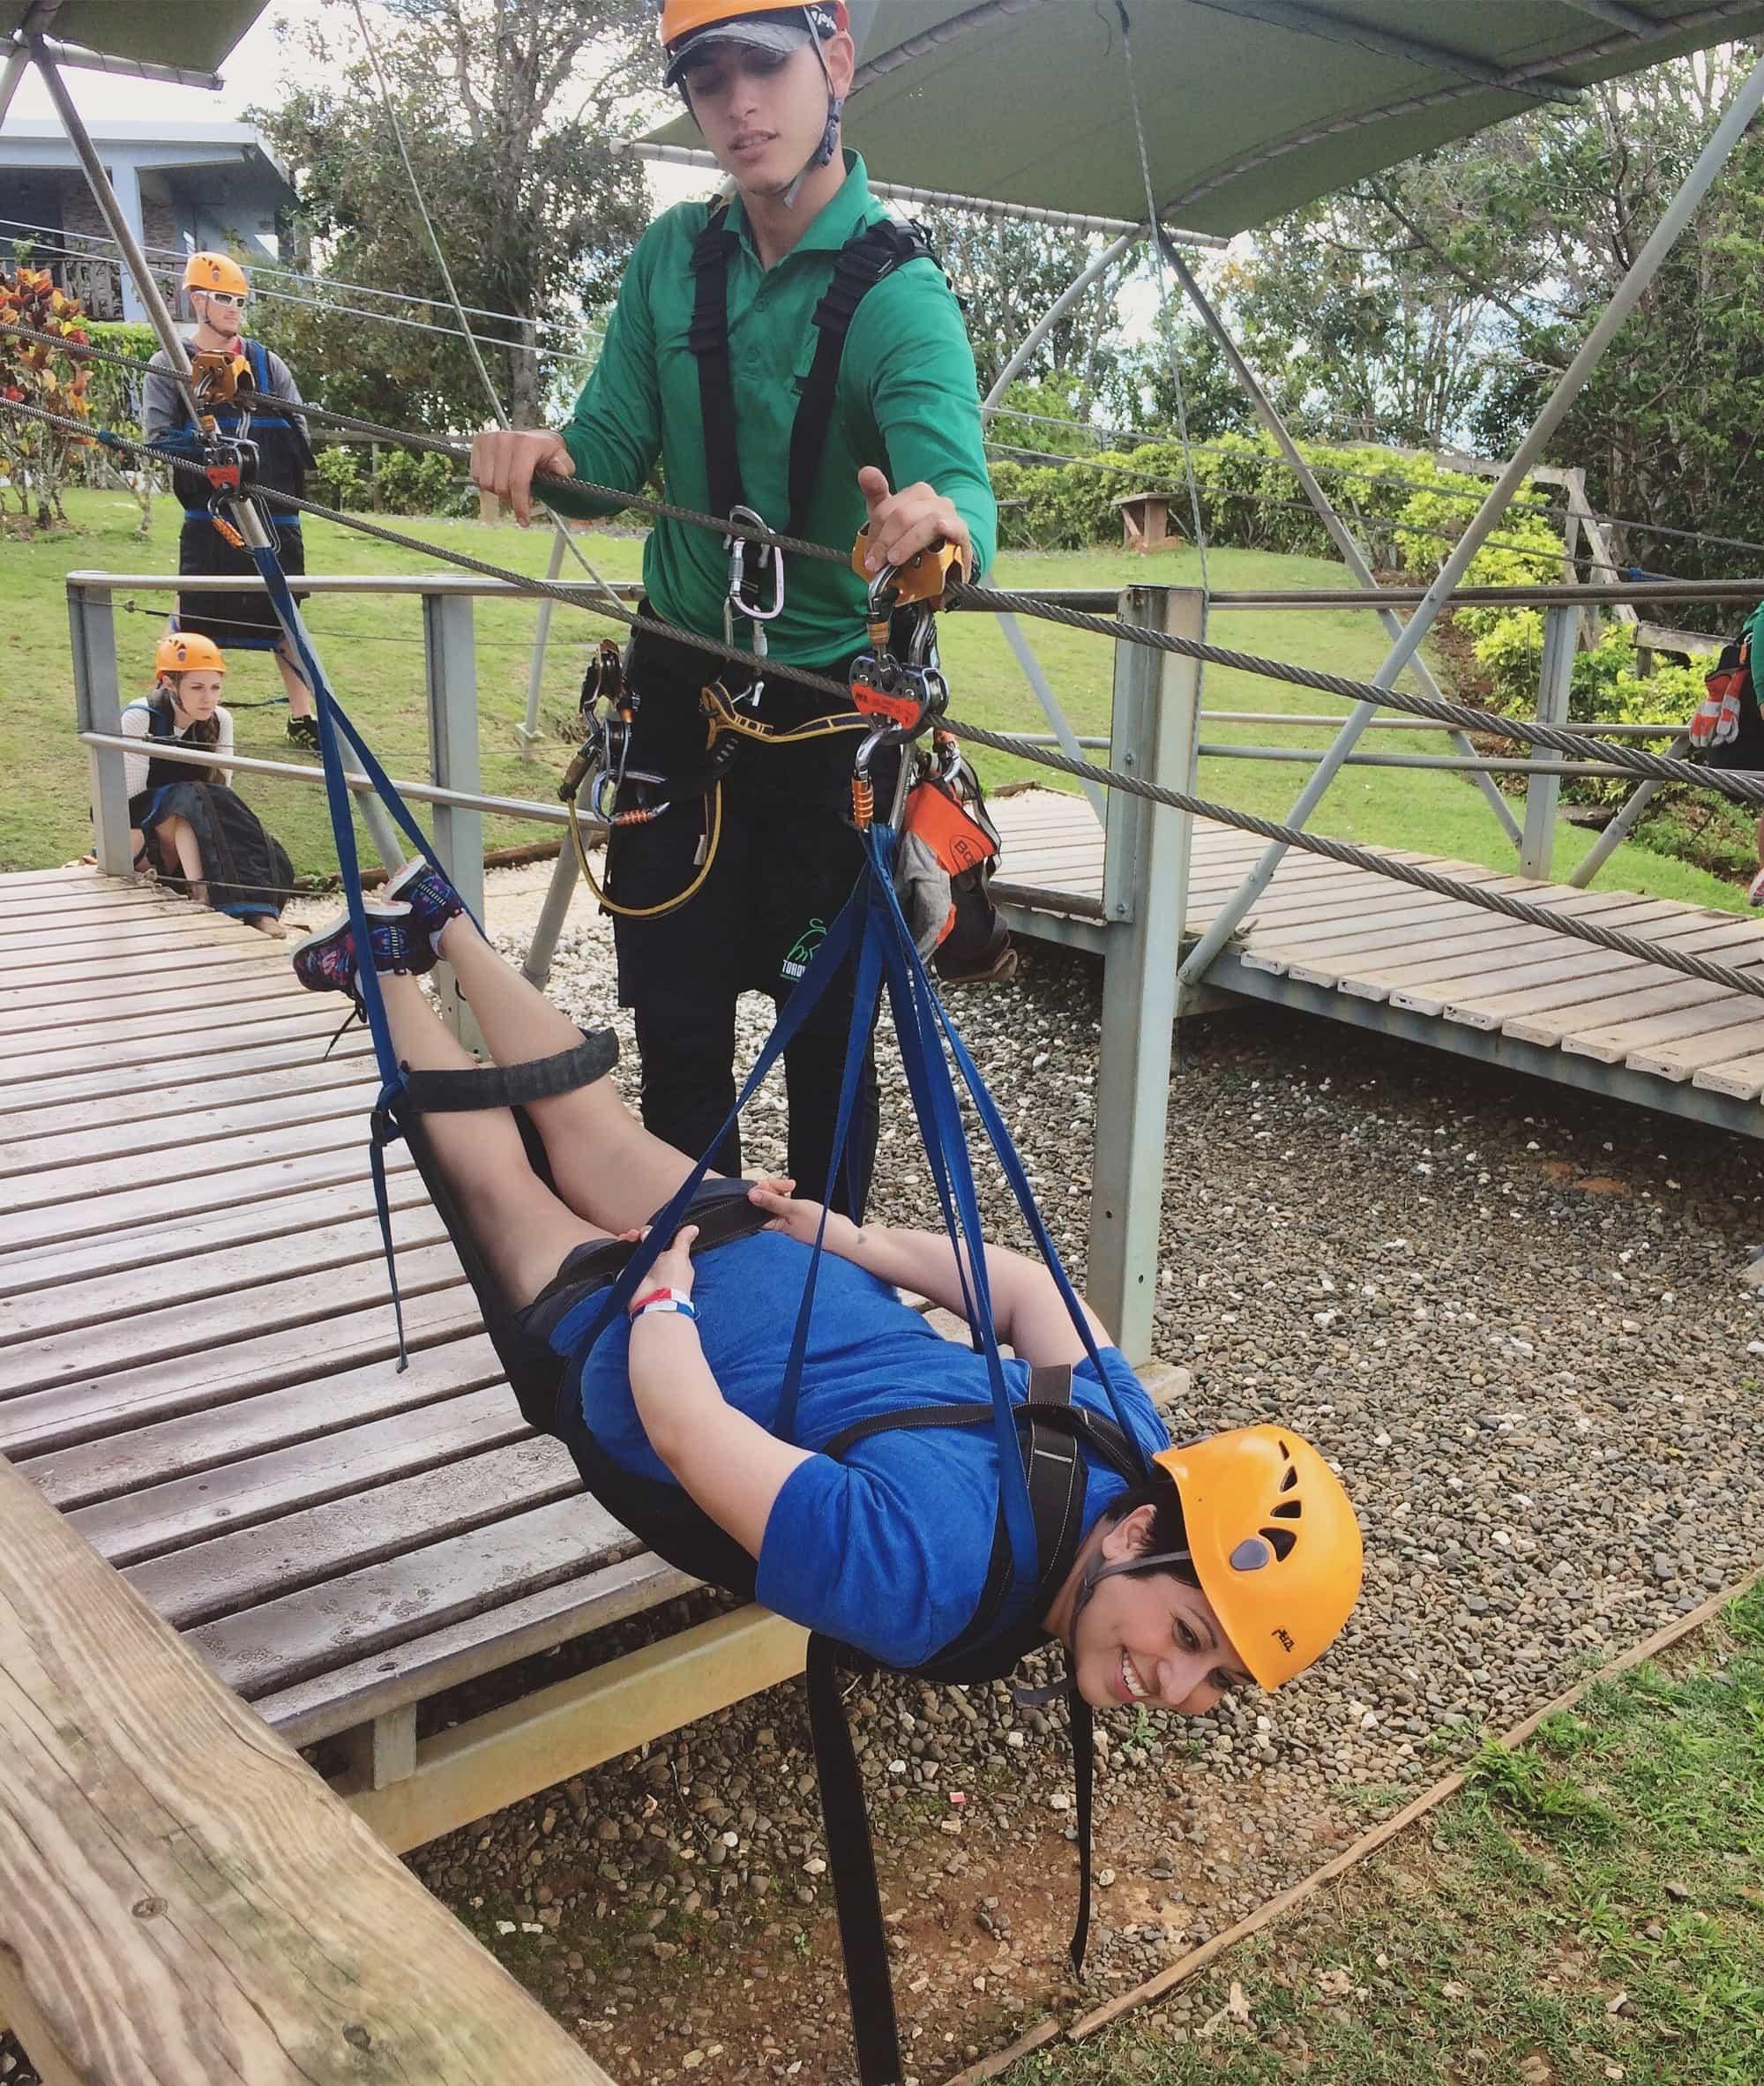 The Beast Zipline at Toro Verde Adventure Park in Puerto Rico